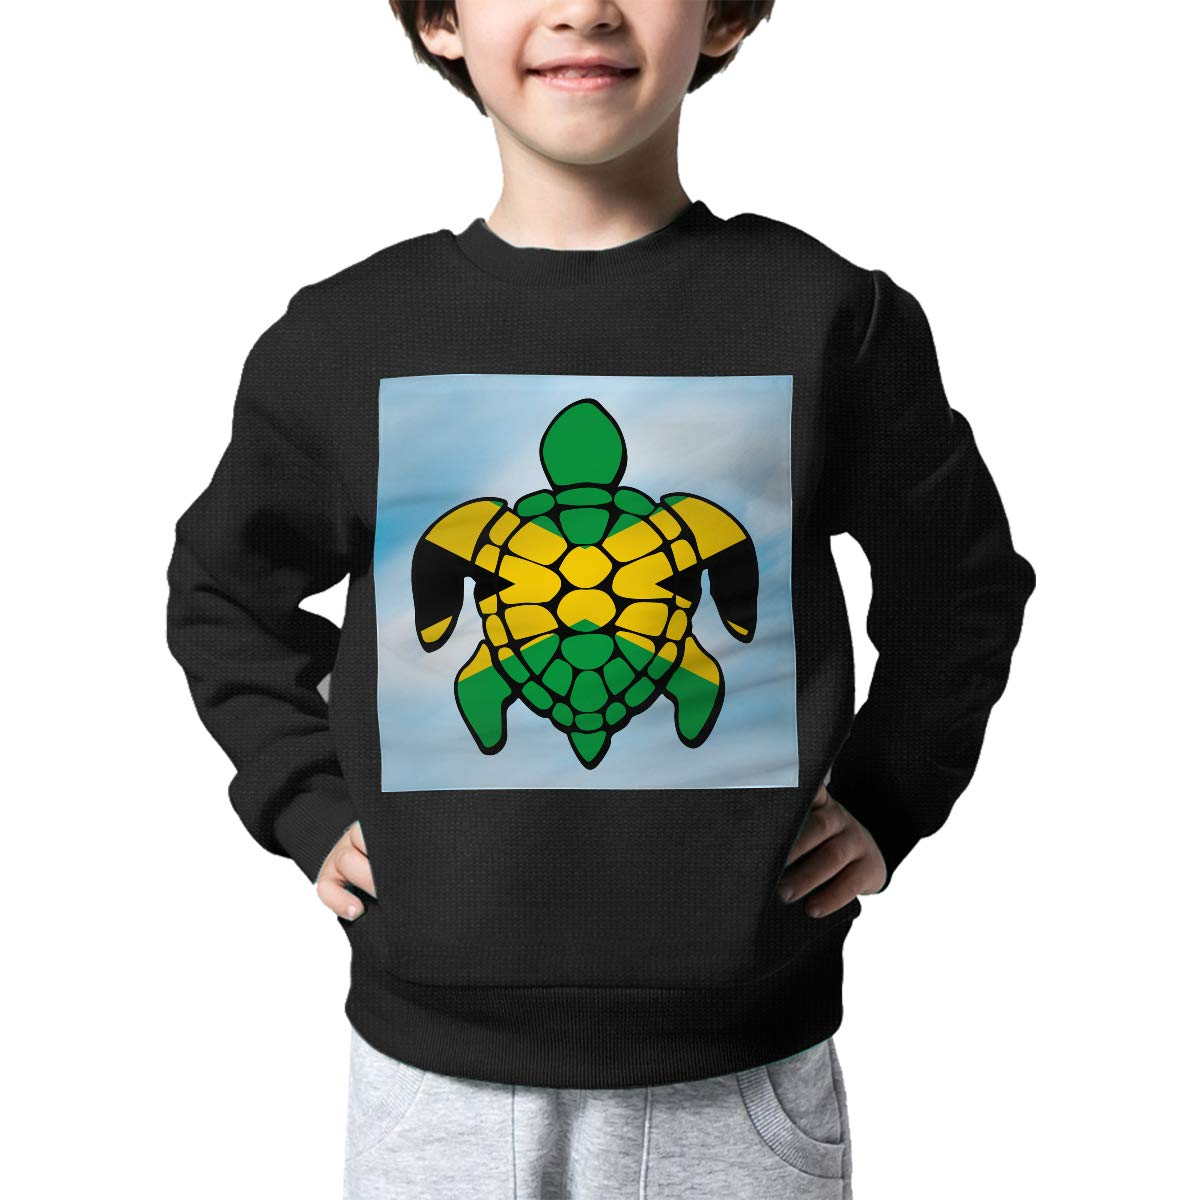 Jamaica Flag Turtle Print Newborn Childrens Crew Neck Sweater Long Sleeve Soft Knitted Sweater Jumper